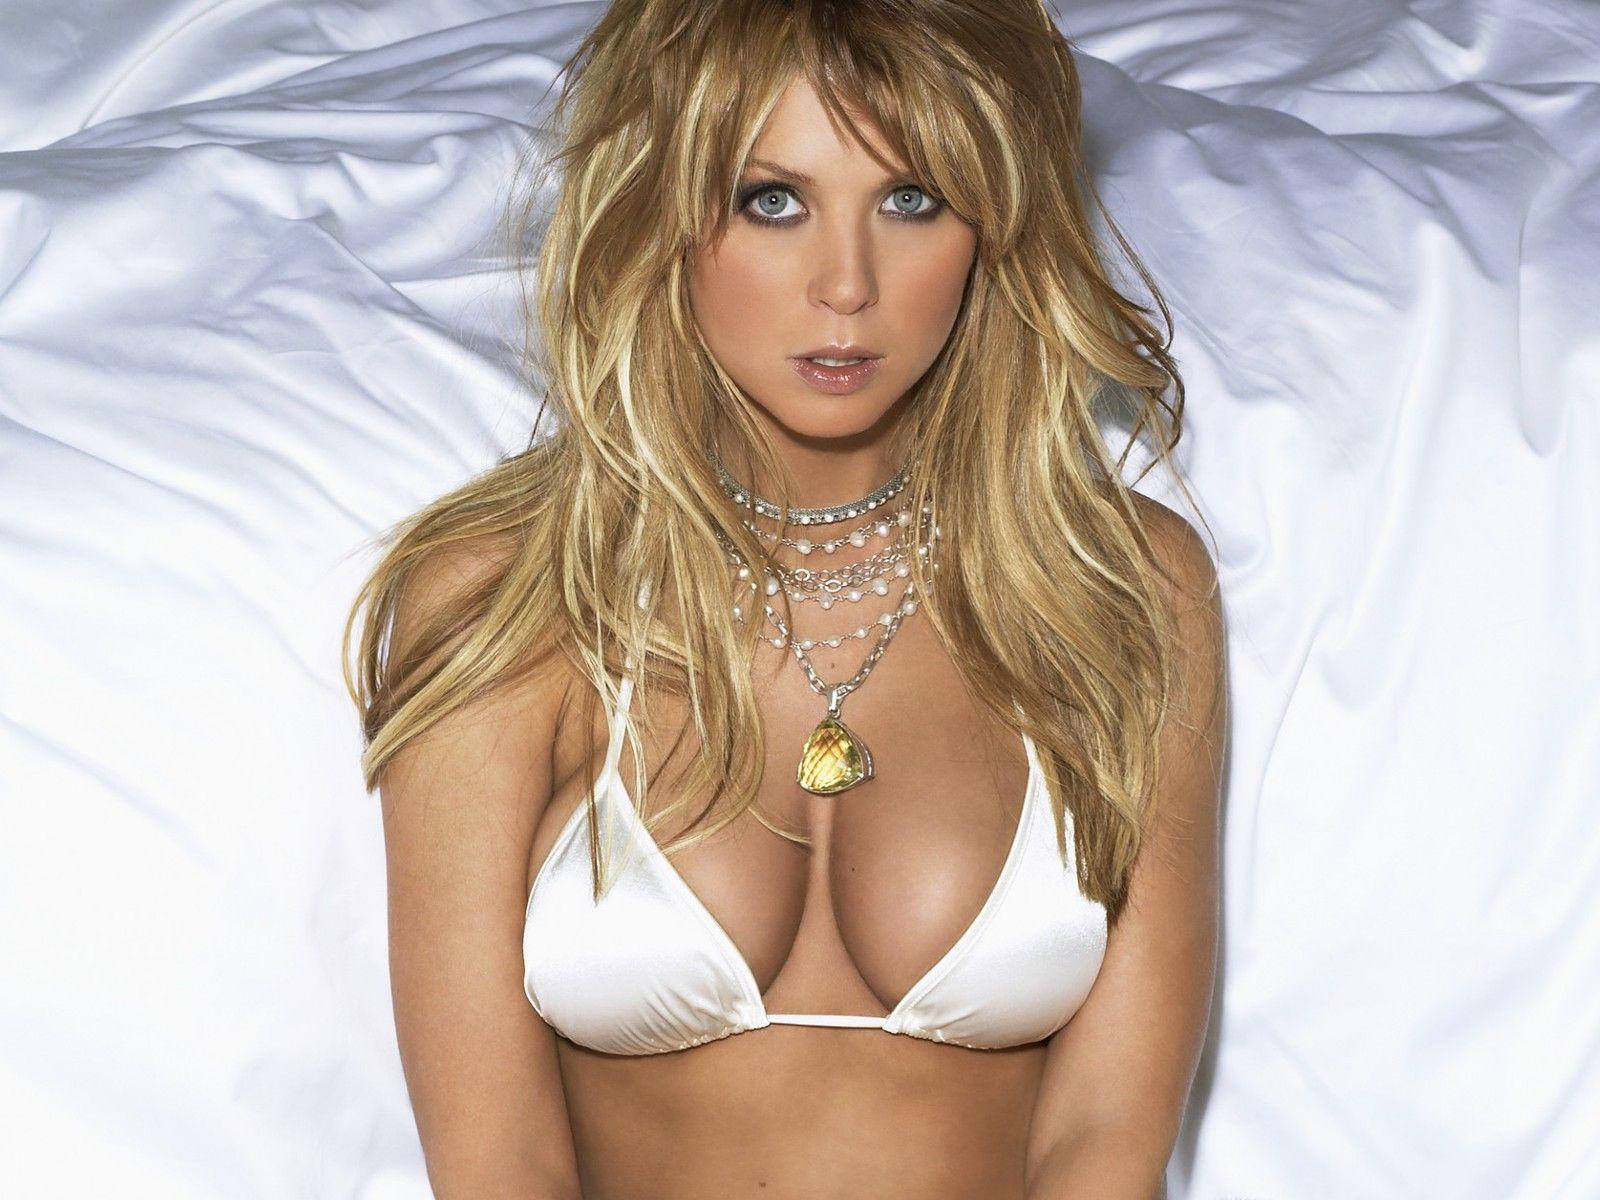 http://2.bp.blogspot.com/-jCgXT7LR6No/ThXzXT5nyVI/AAAAAAAAH3w/NS4M-V_Jp8A/s1600/tara_reid+hot+bikini.jpg